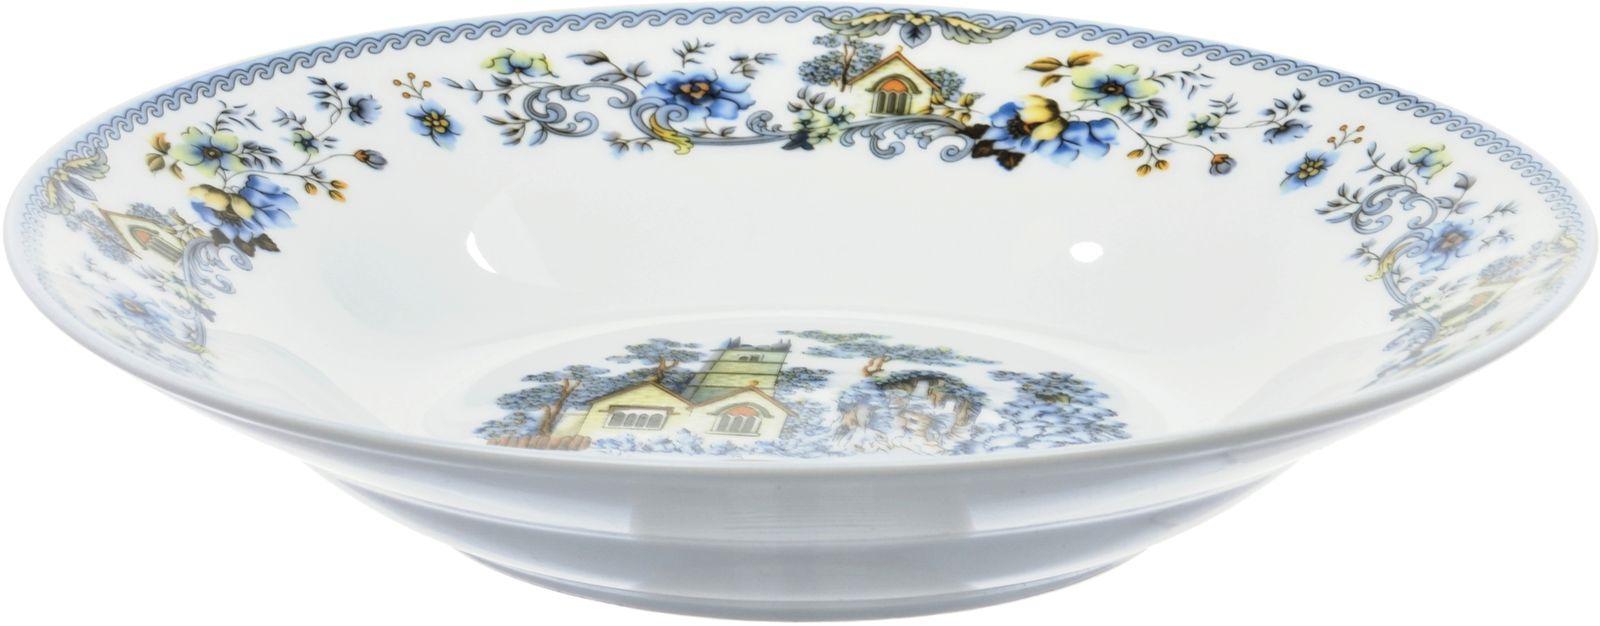 Тарелка глубокая Dasen, белый, 20 см посуда